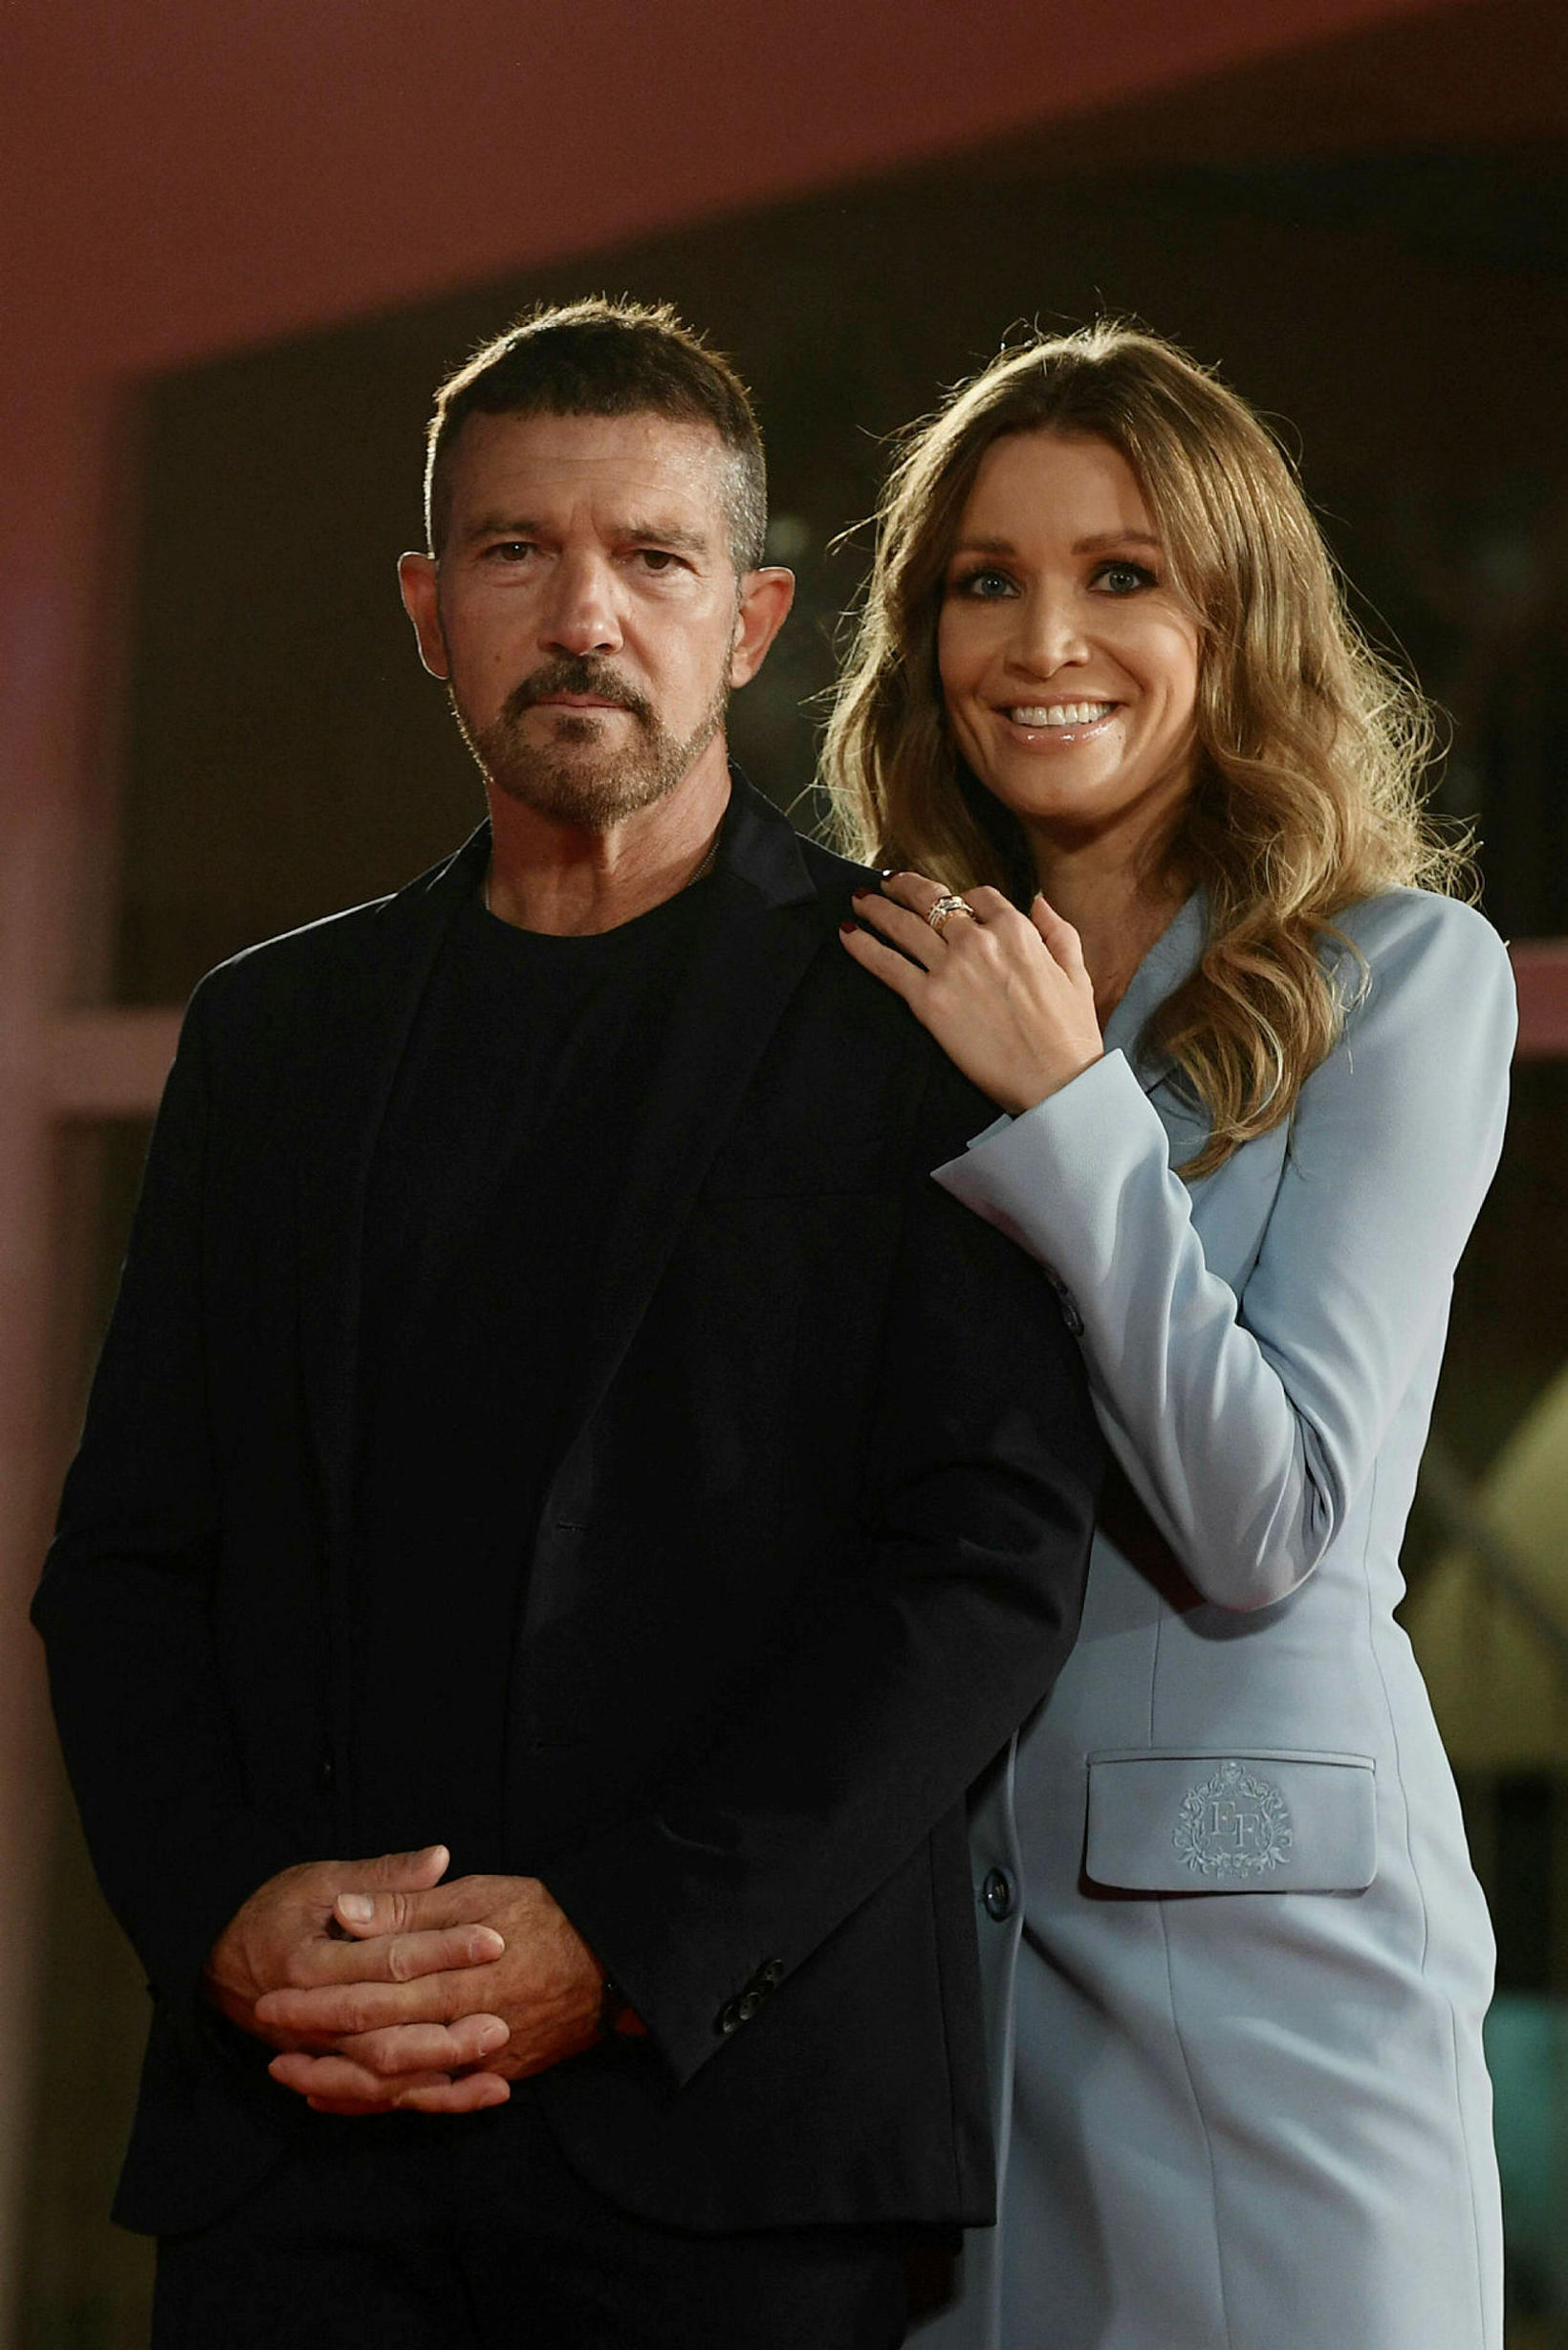 Antonio Banderas og Nicole Kimpel brostu á rauða dreglinum.